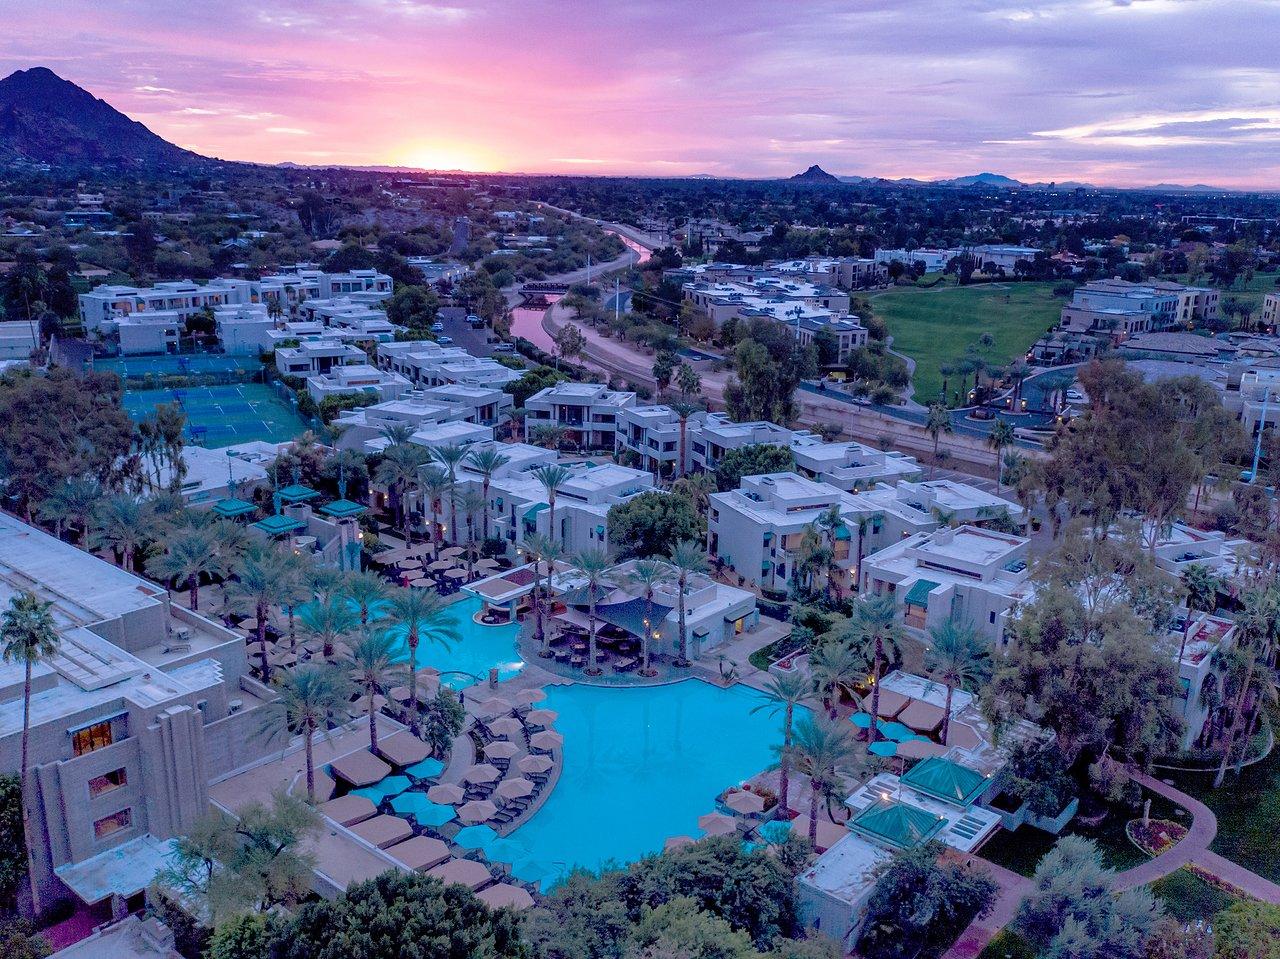 site de rencontres gratuit Phoenix Arizona